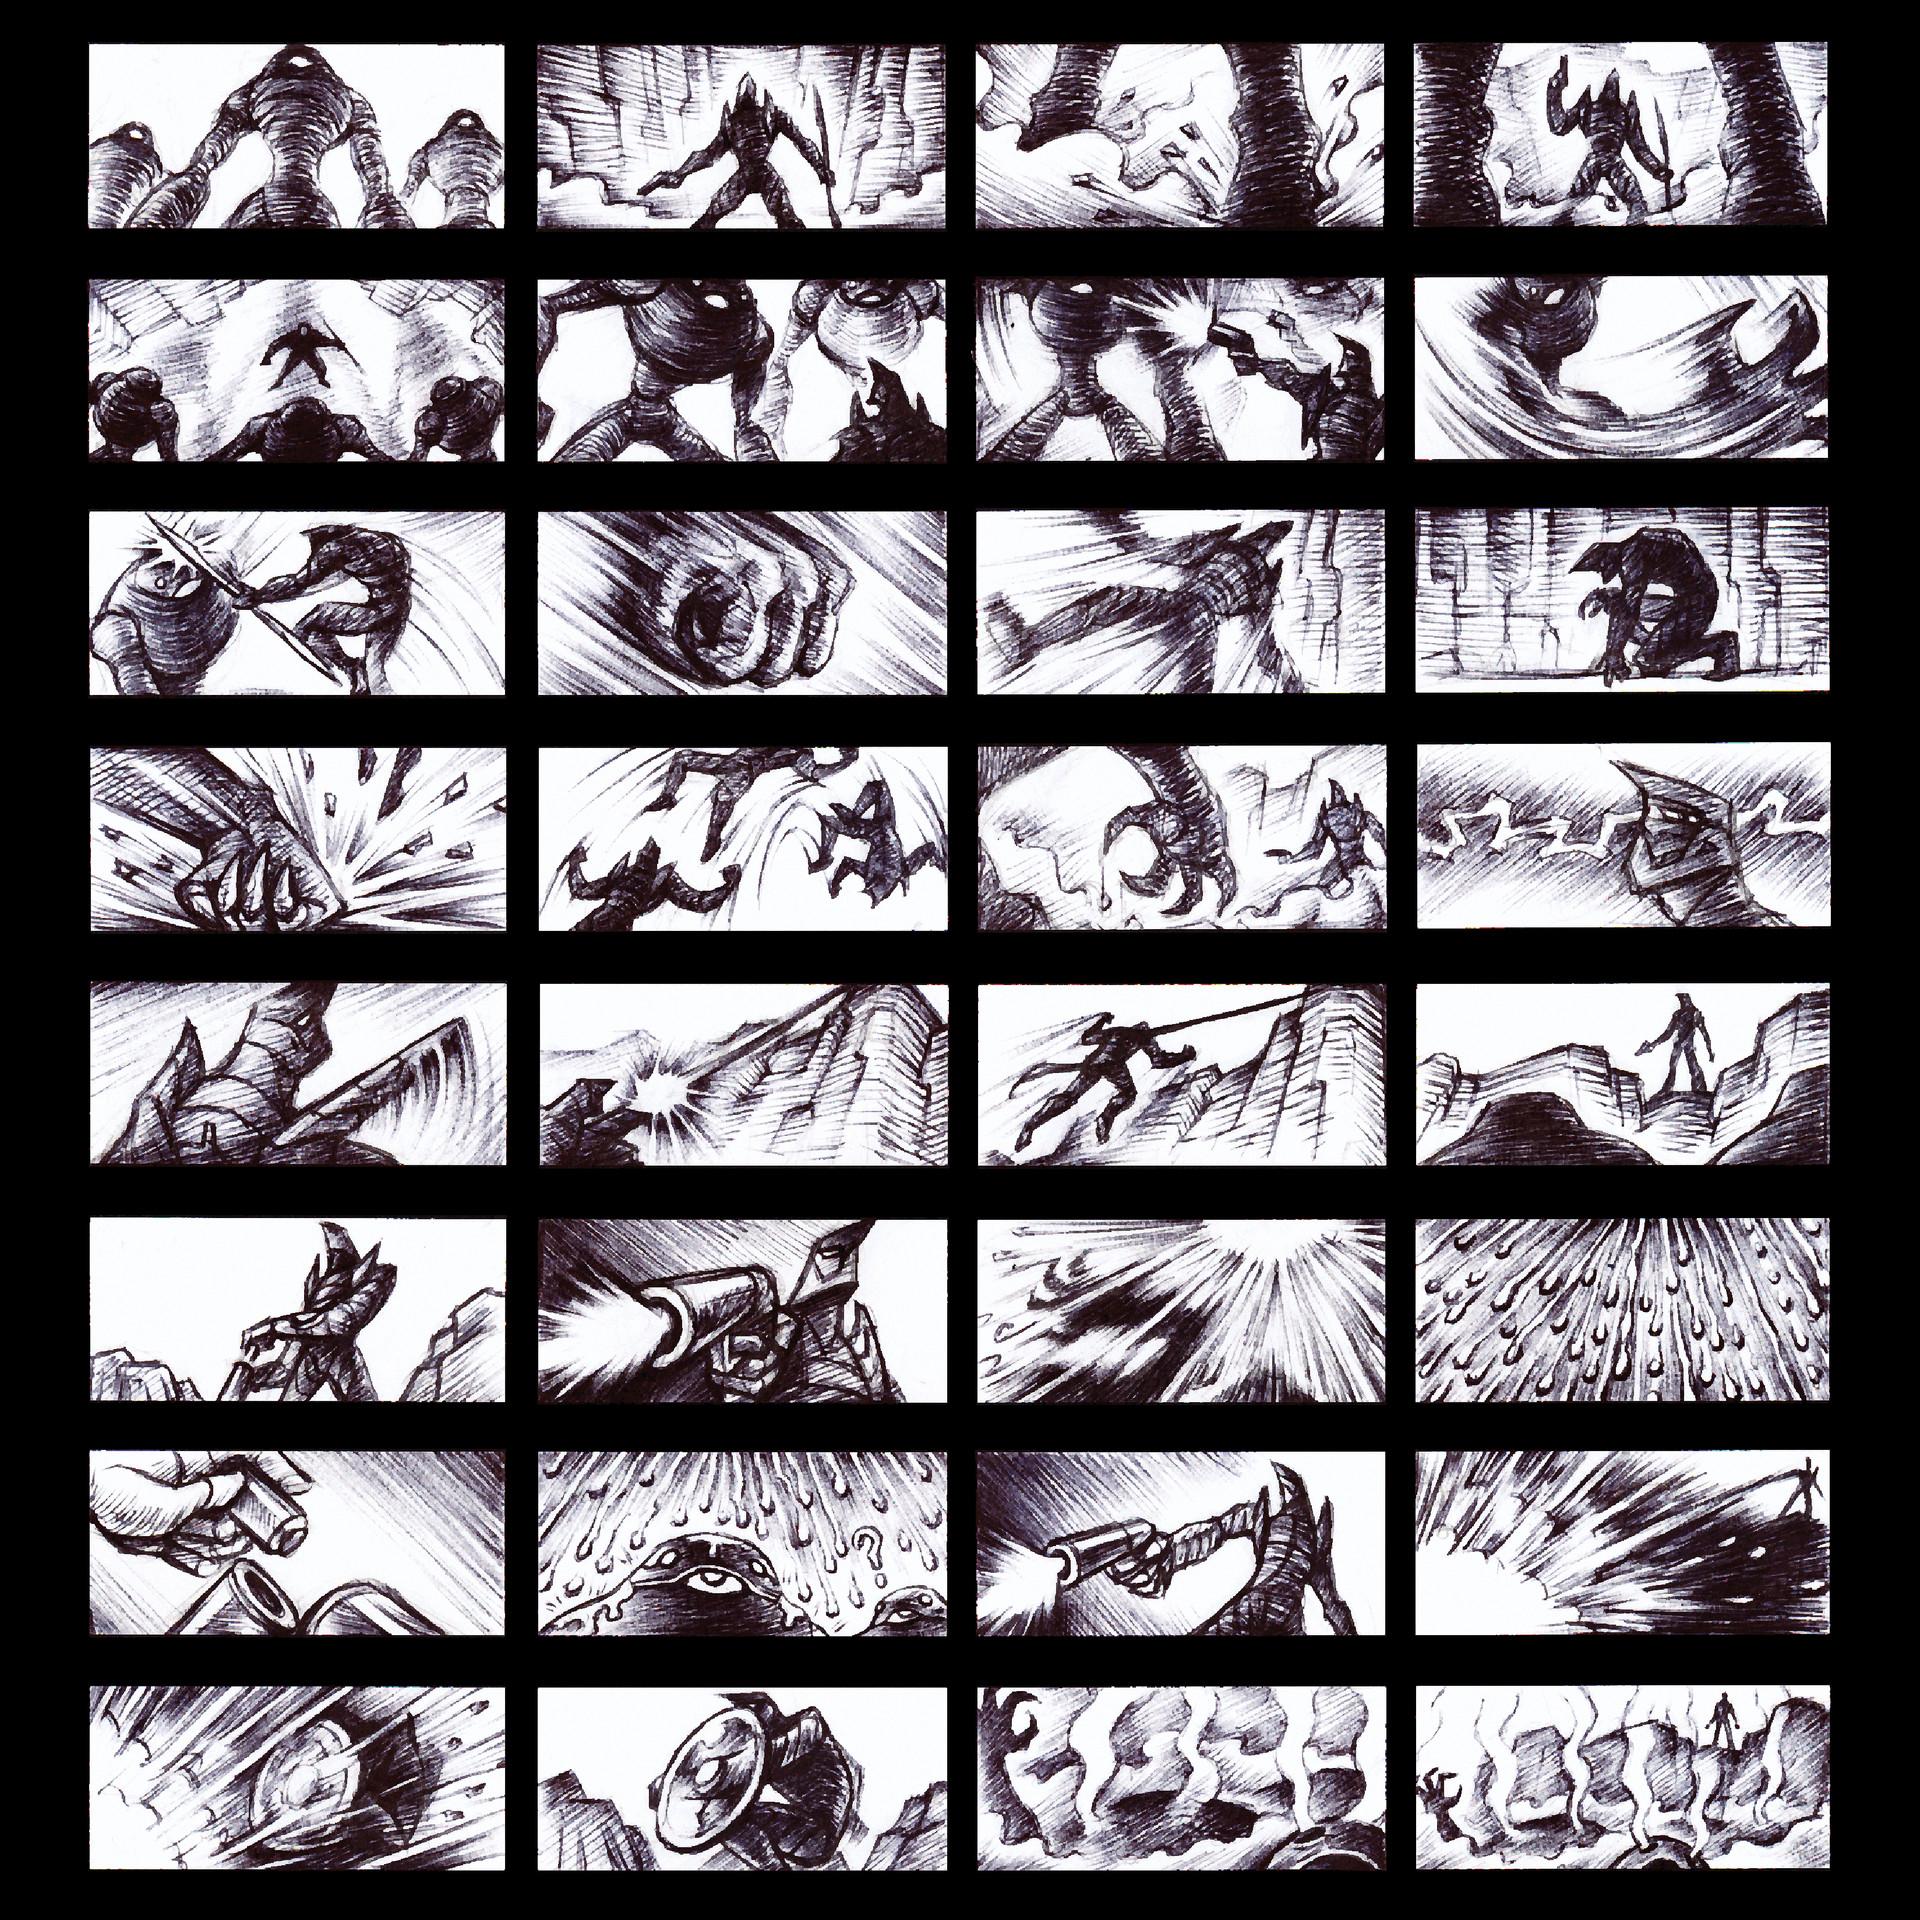 E lynx lin hinterland storyboard